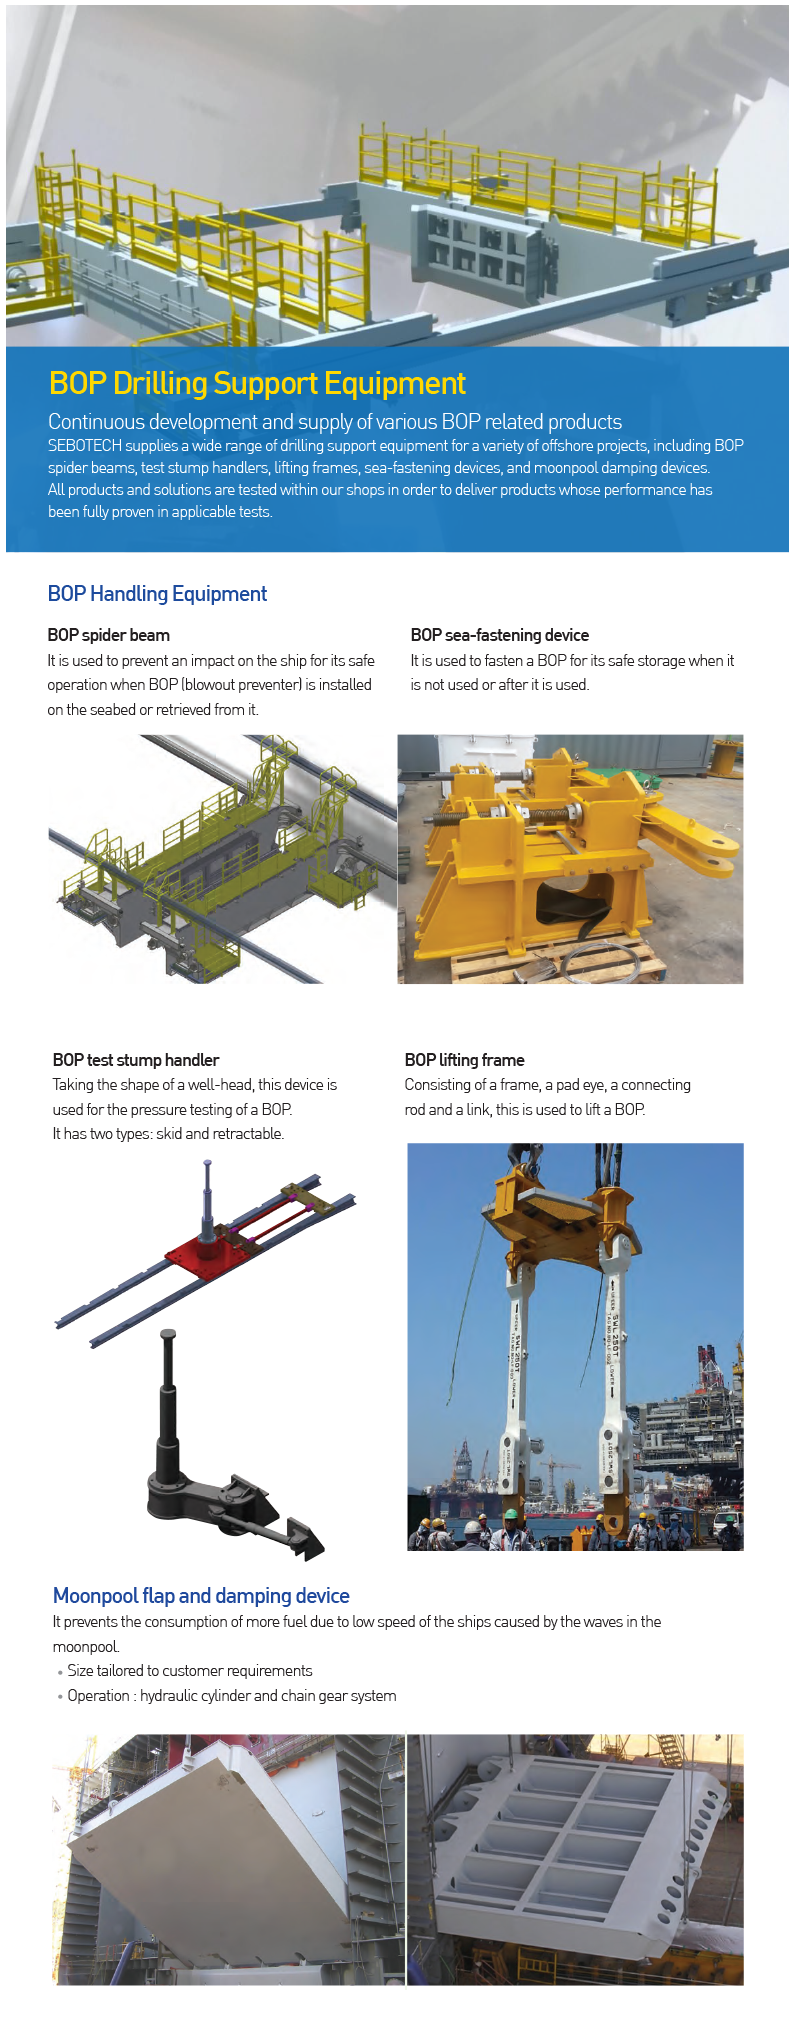 SEBOTECH BOP Drilling Support Equipment